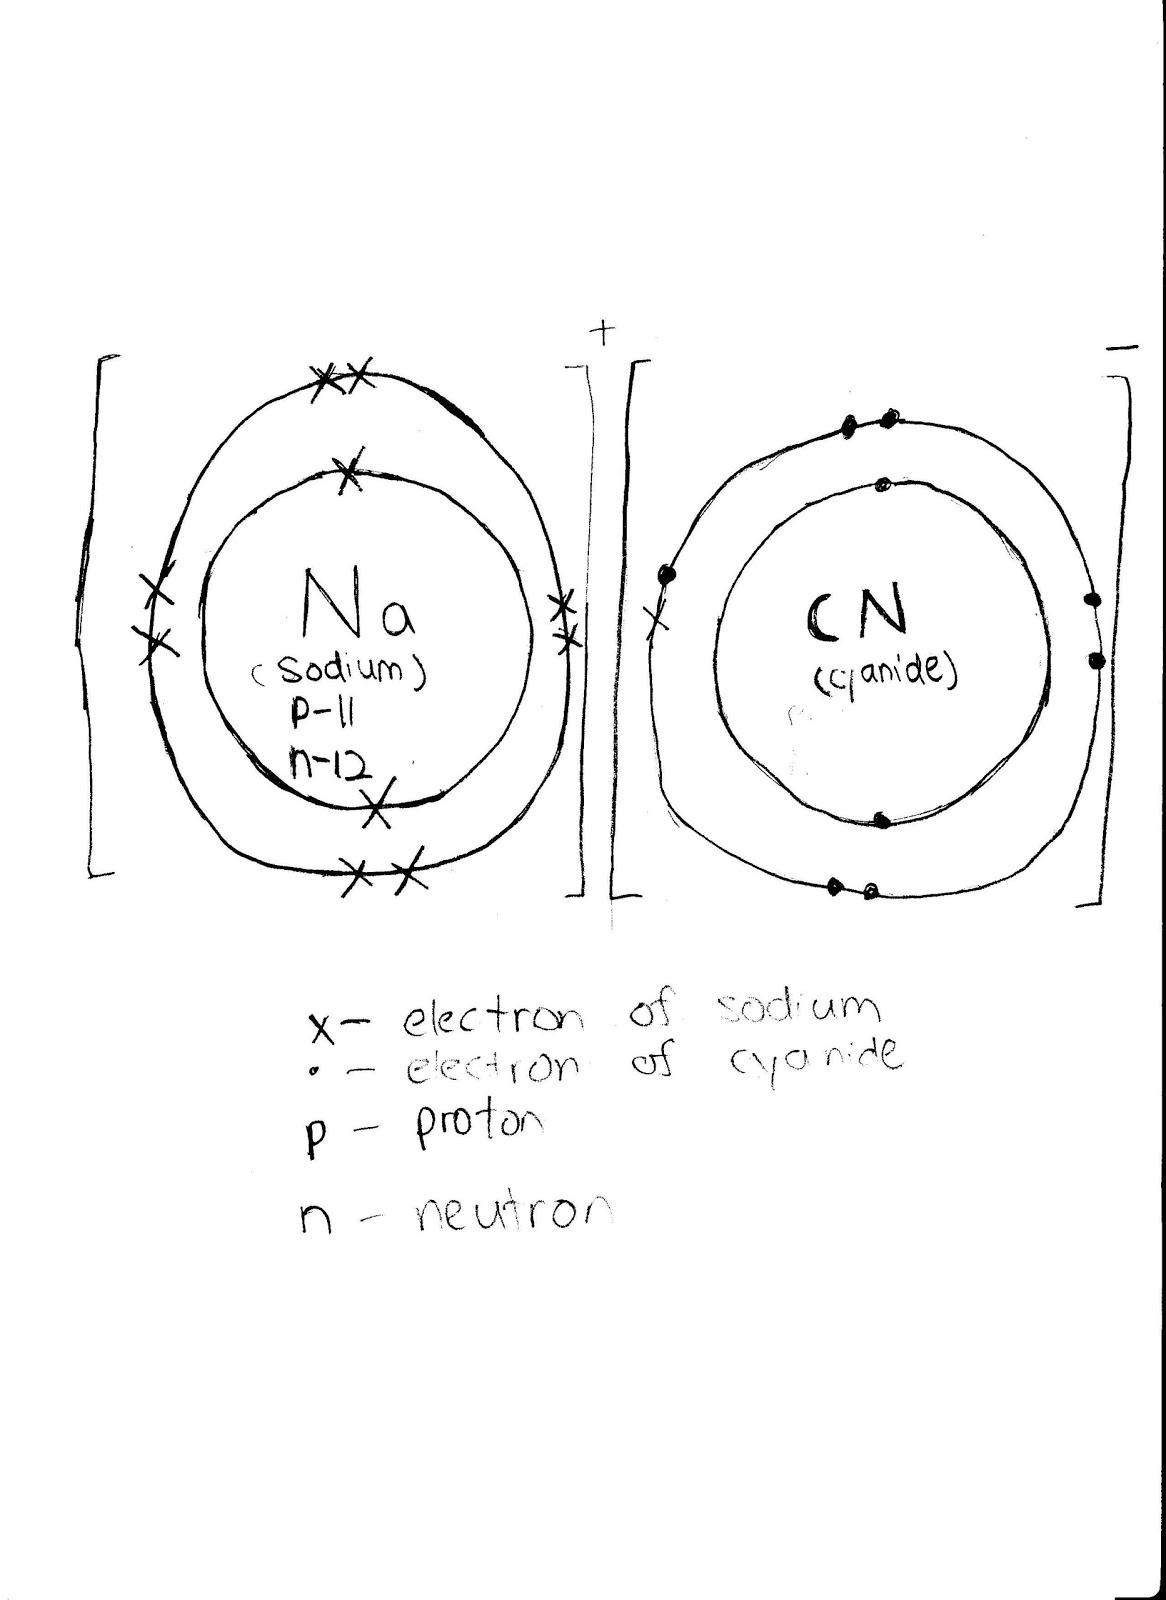 2p3 lss  sodium cyanide